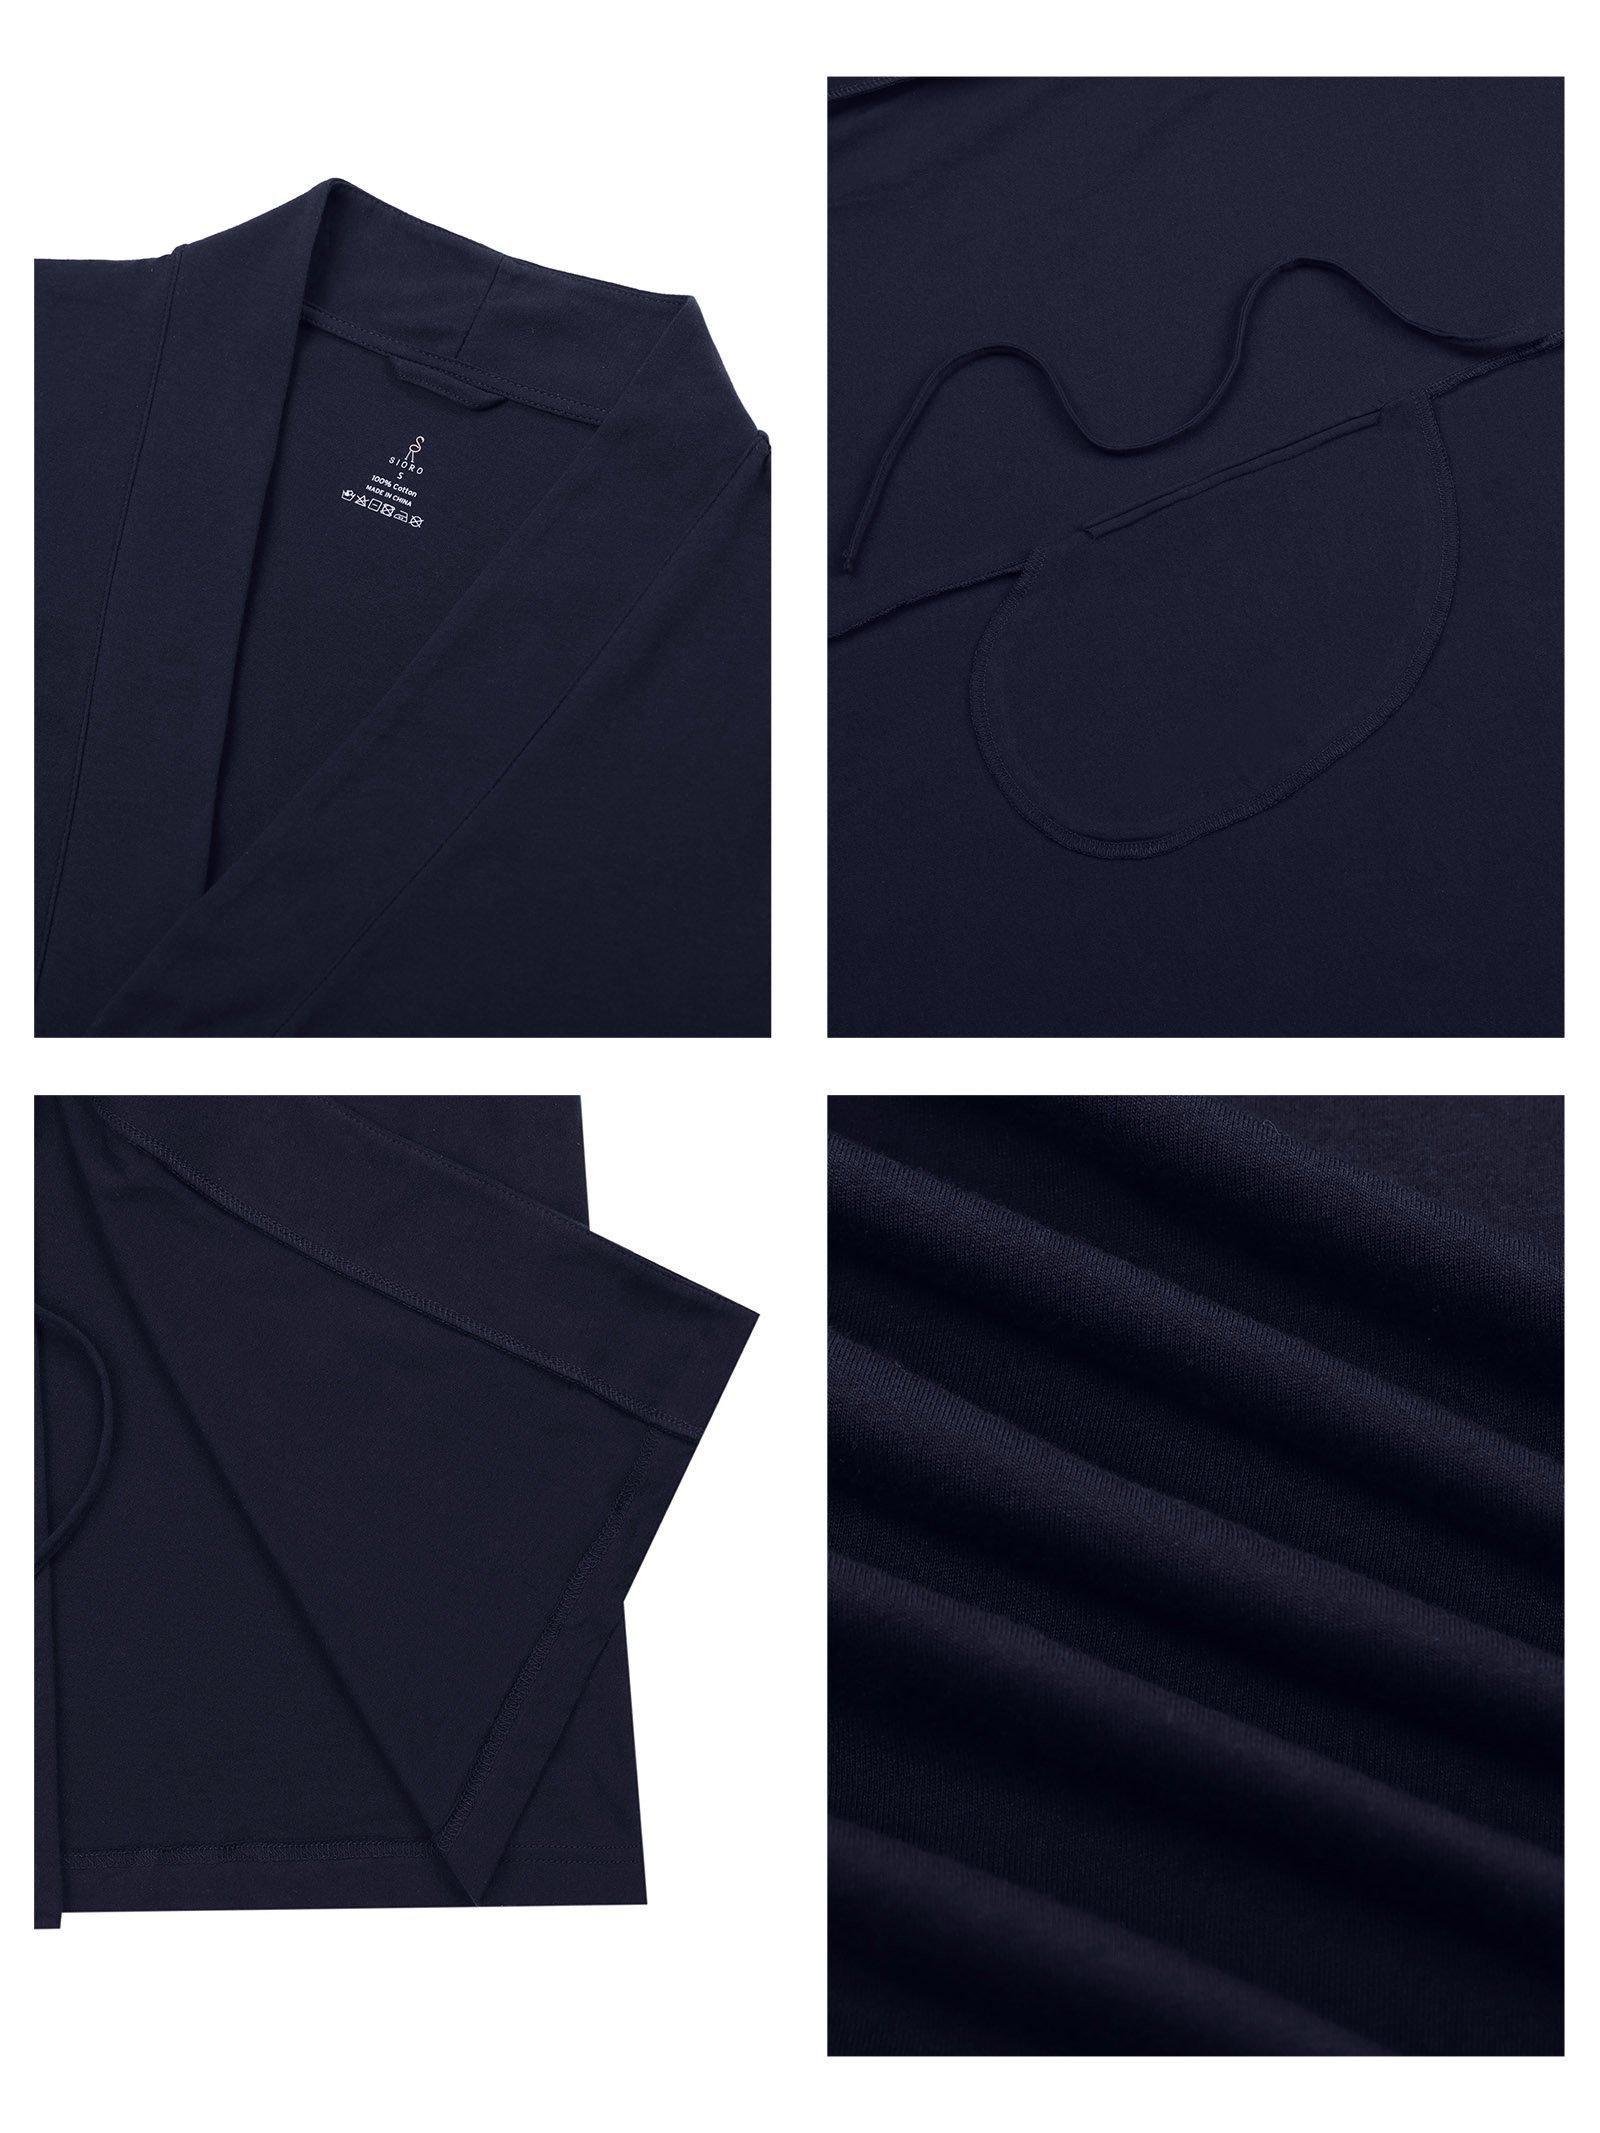 SIORO Cotton Robes Lightweight Kimono Robe Gowns Soft Knit Bathrobe Nightwear V-Neck Loungewear Sexy Sleepwear Short for Women, Black, S by SIORO (Image #5)